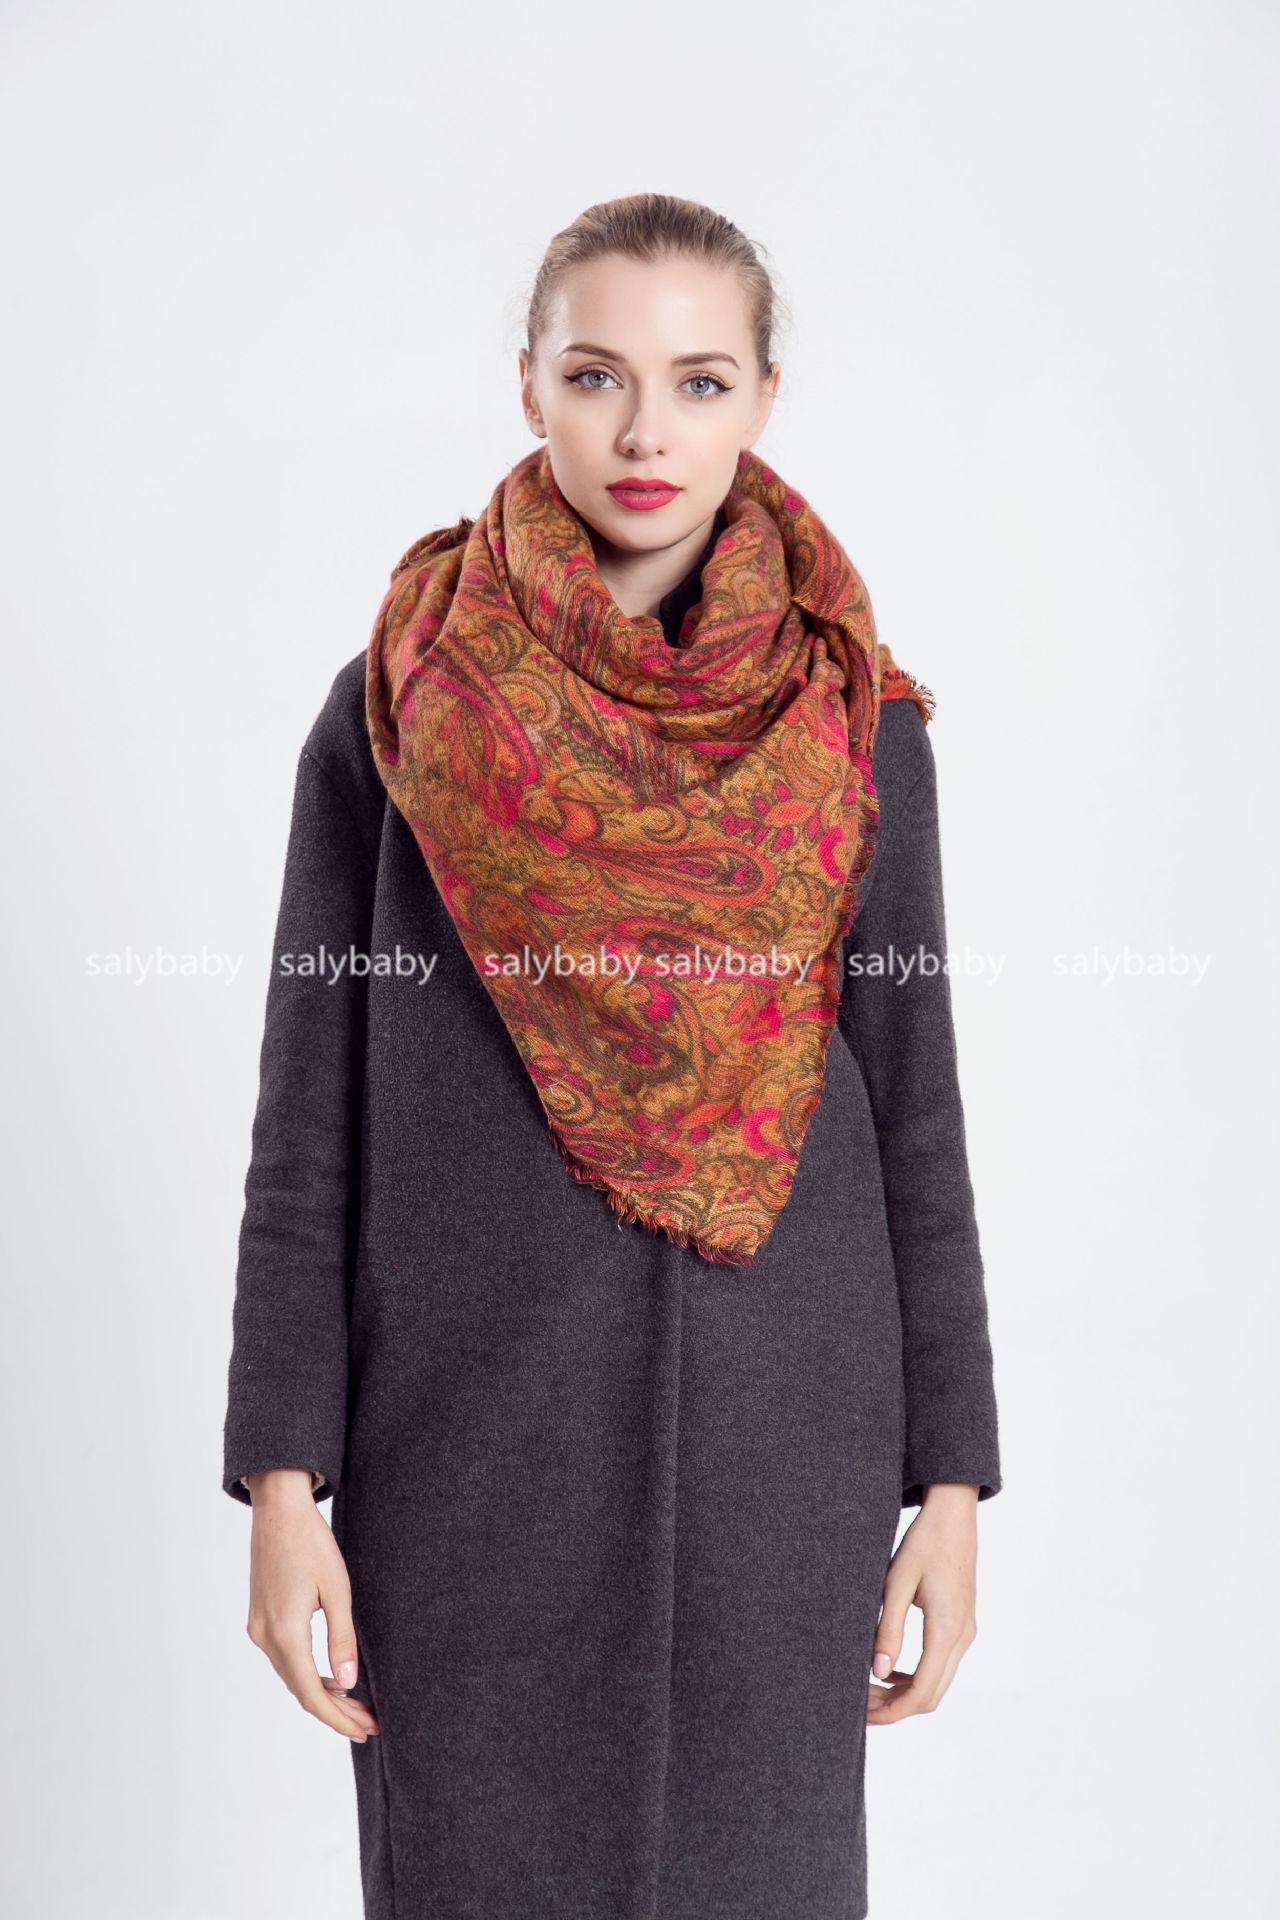 2016 New Winter Warm Female Print Scarf European Style Pashmina Dual-purpose Wholesale